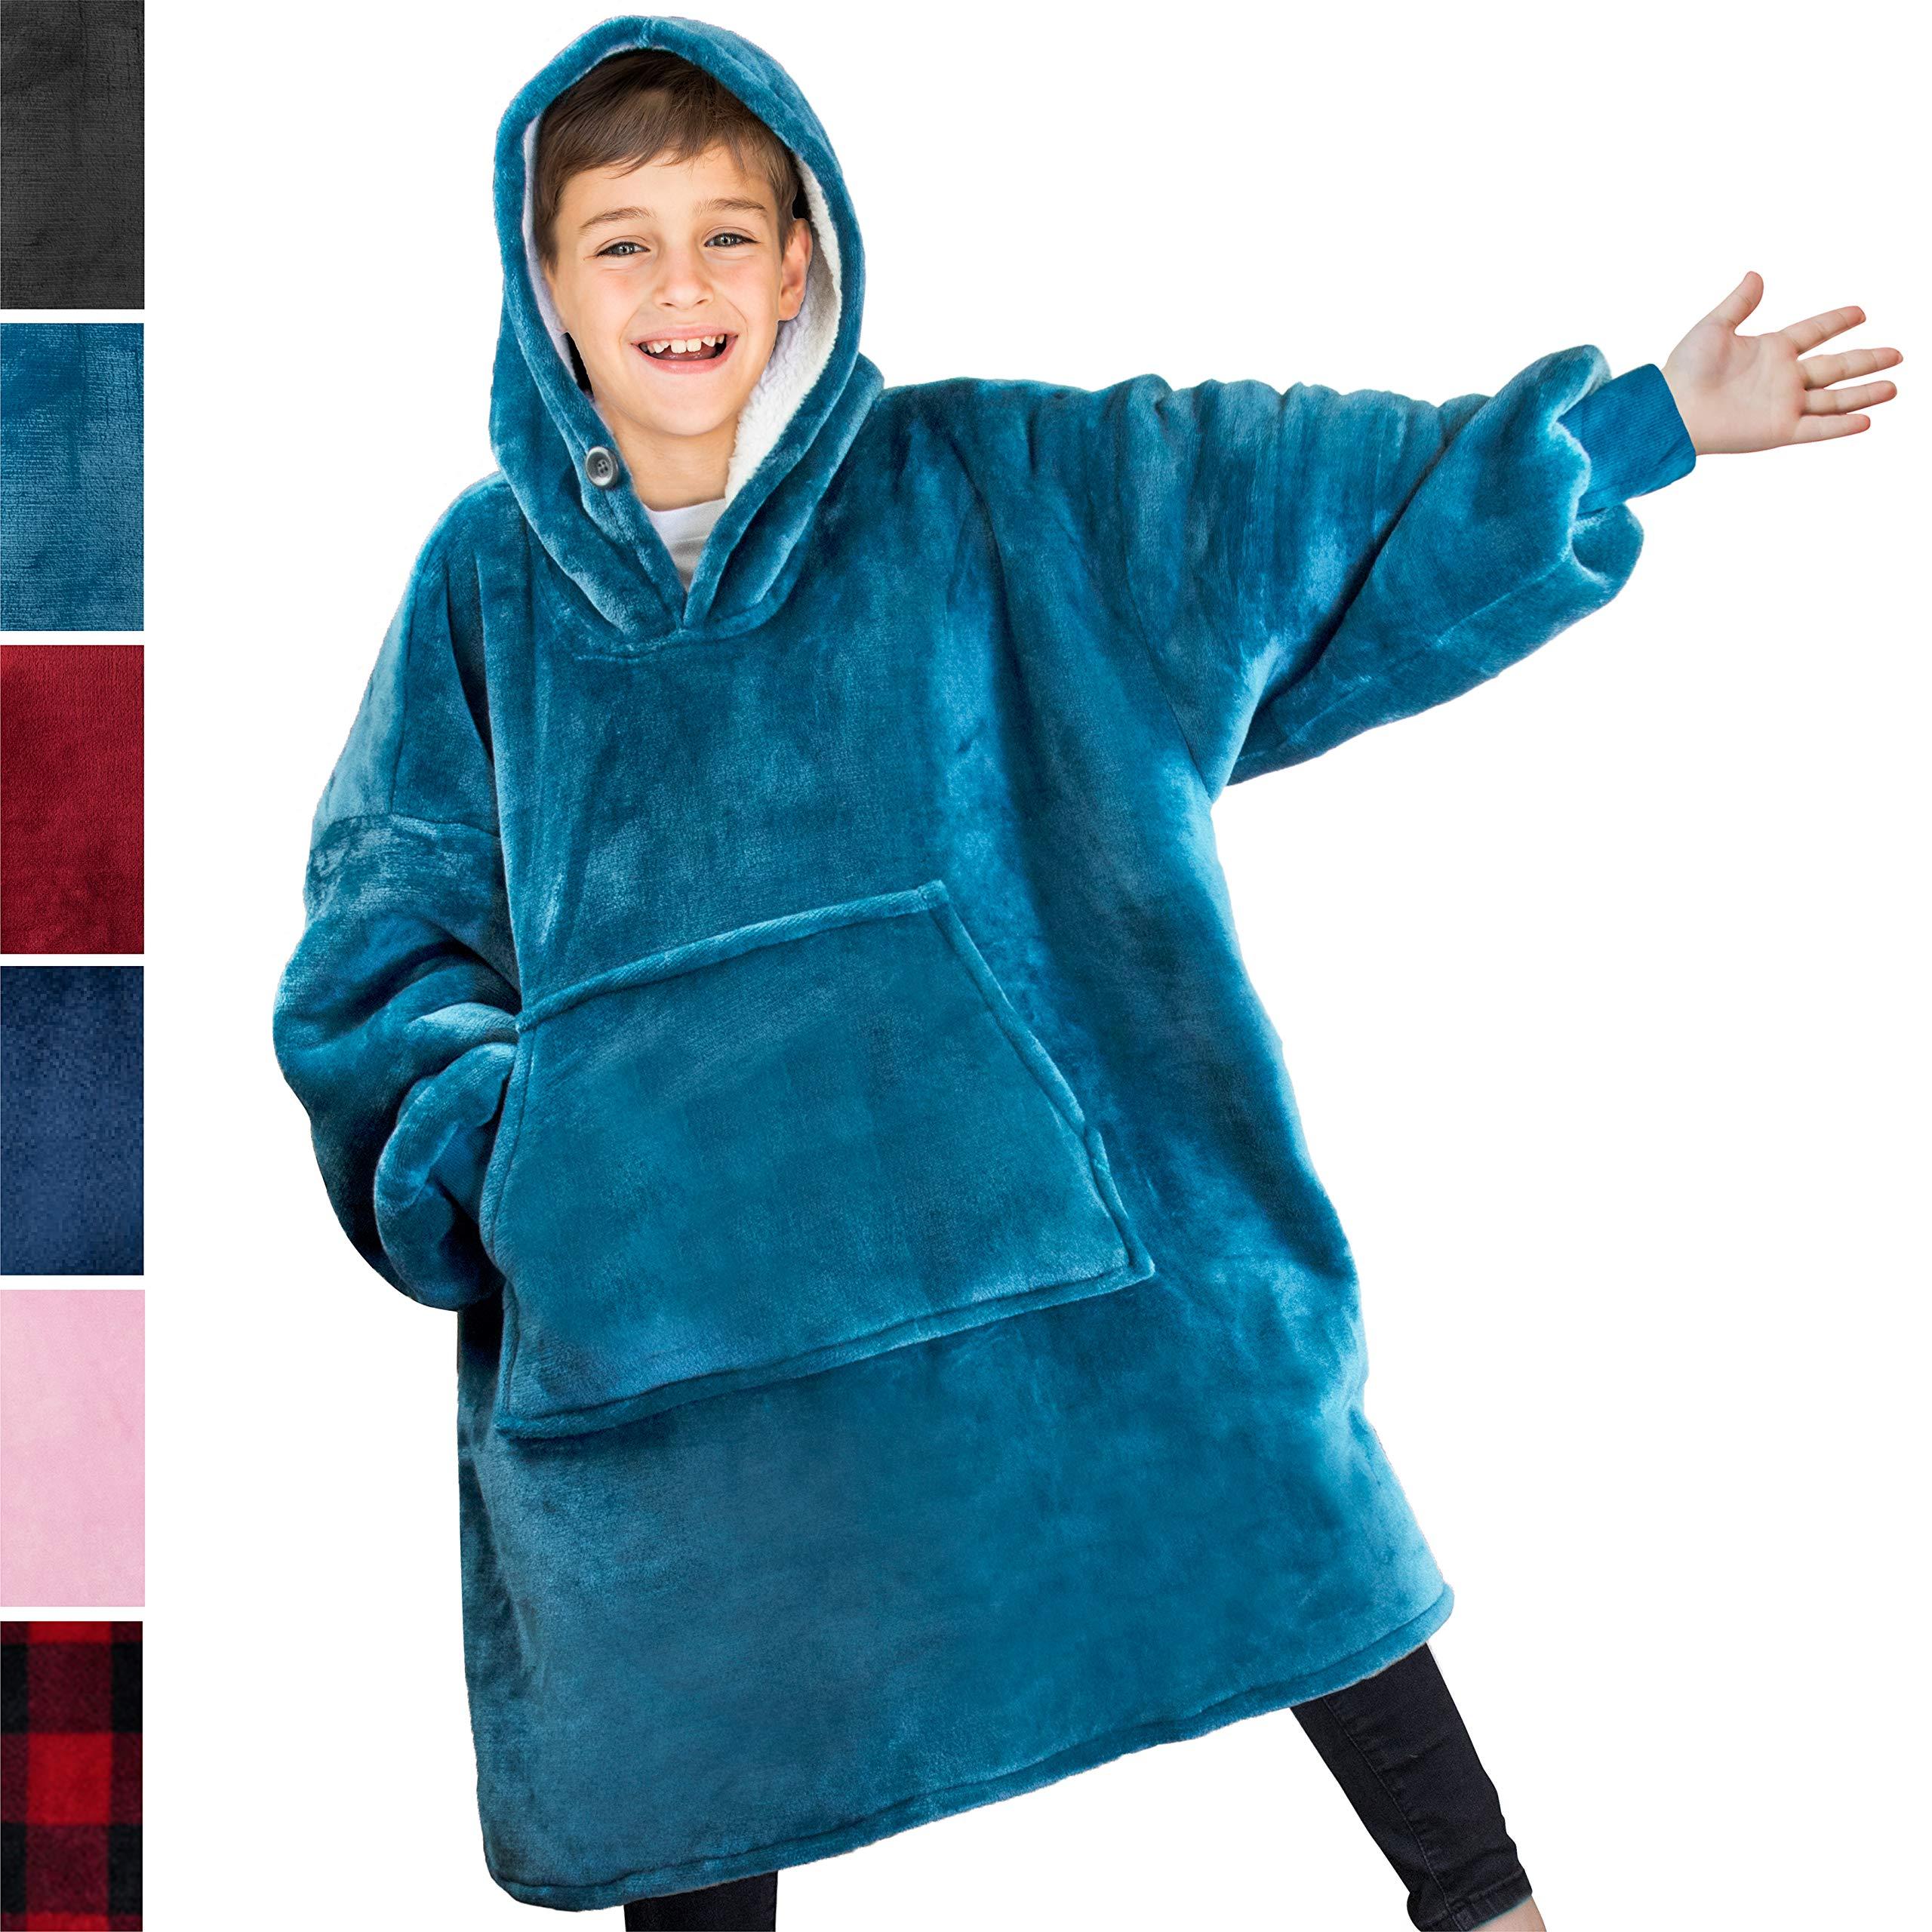 PAVILIA Blanket Sweatshirt with Sherpa Lining for Kids, Children | Super Soft, Warm, Reversible Hoodie Blanket for Boys, Girls | Giant Hood, Oversized Fleece Pullover with Pocket (Sea Blue) by PAVILIA